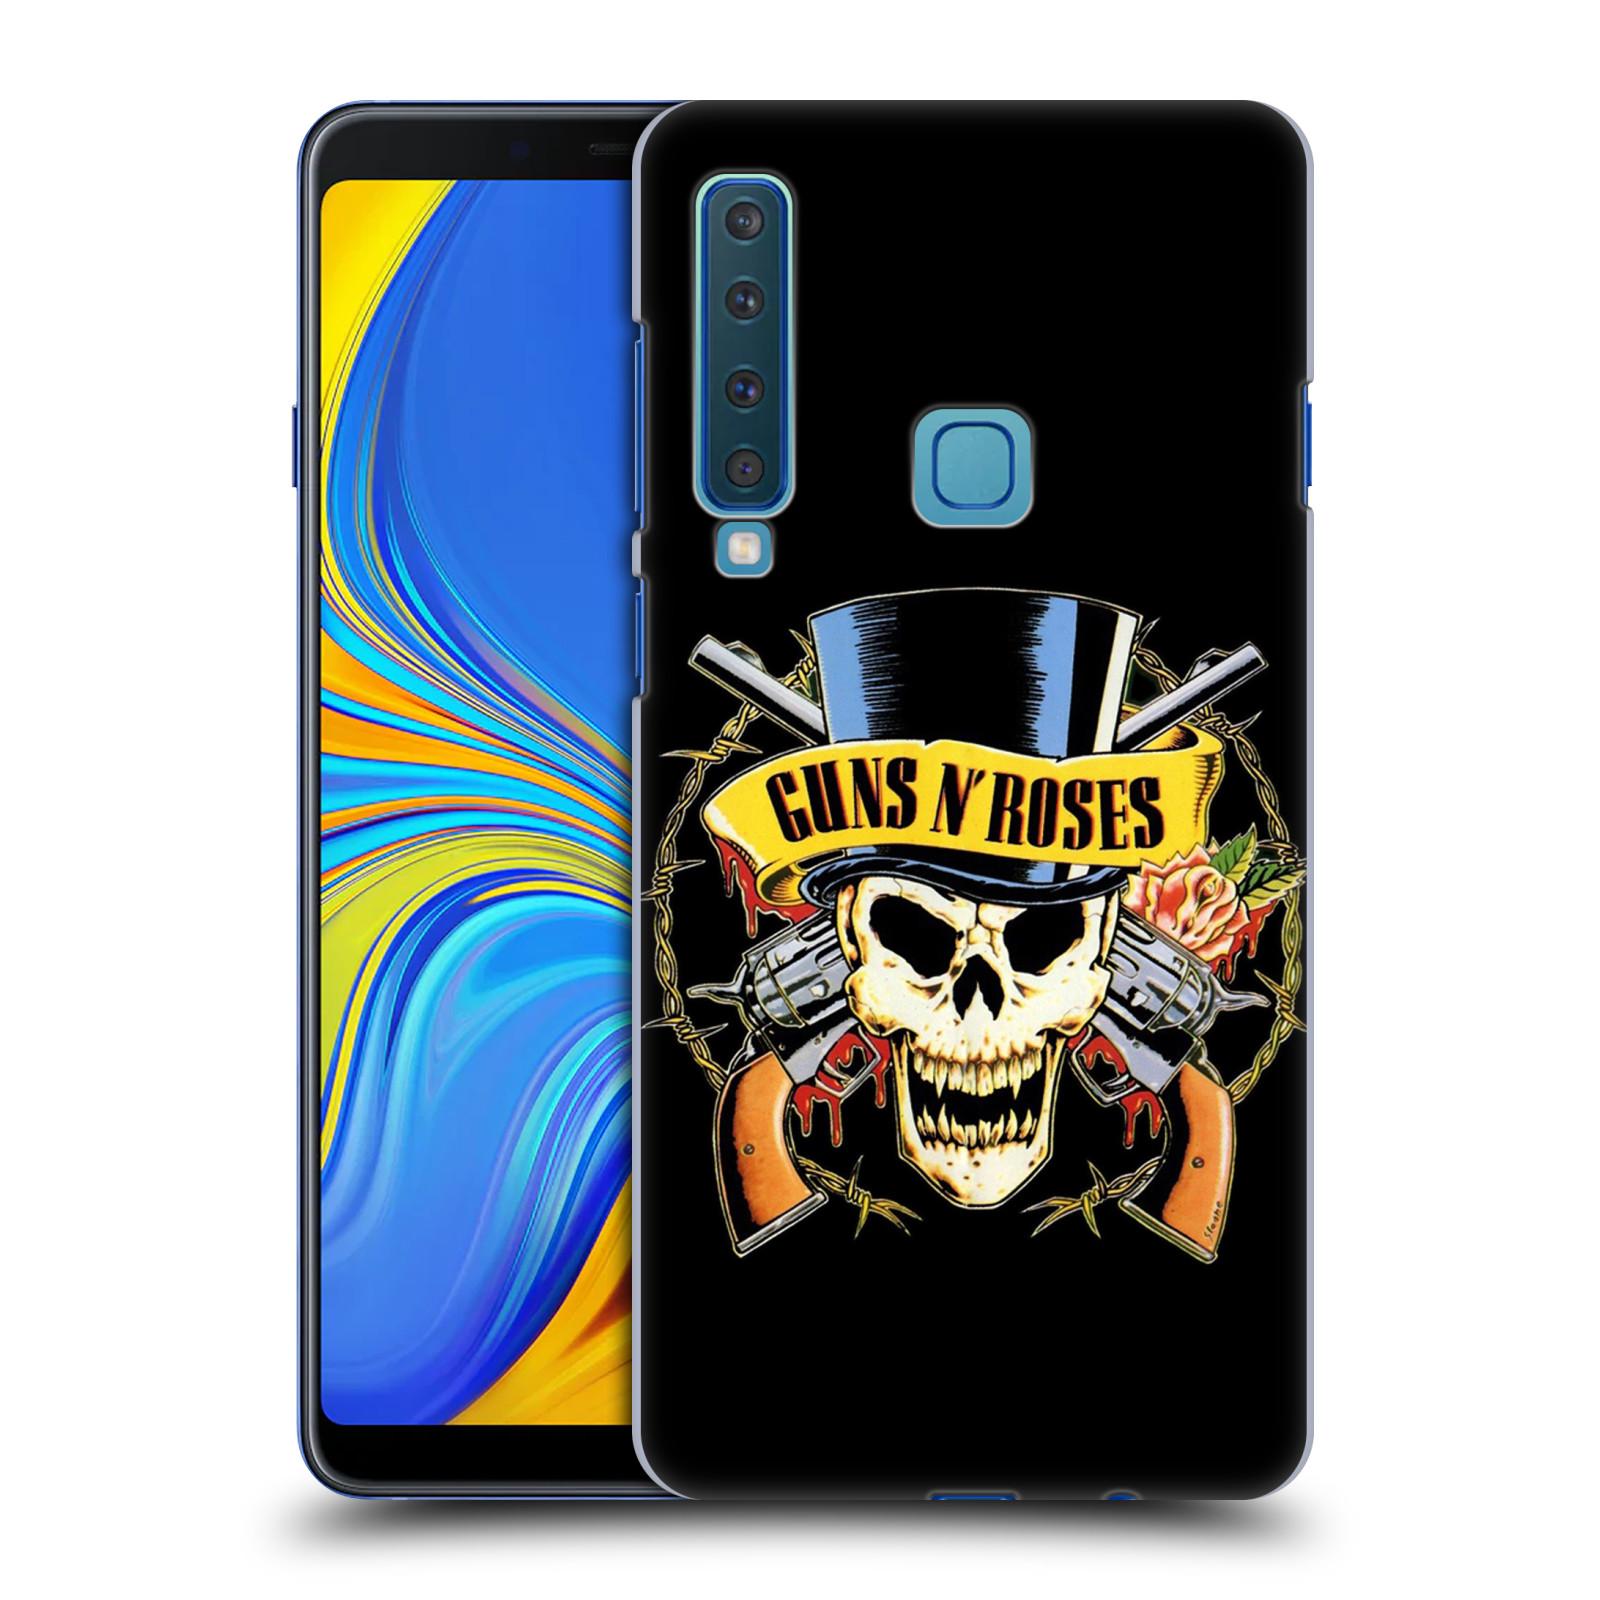 Plastové pouzdro na mobil Samsung Galaxy A9 (2018) - Head Case - Guns N' Roses - Lebka